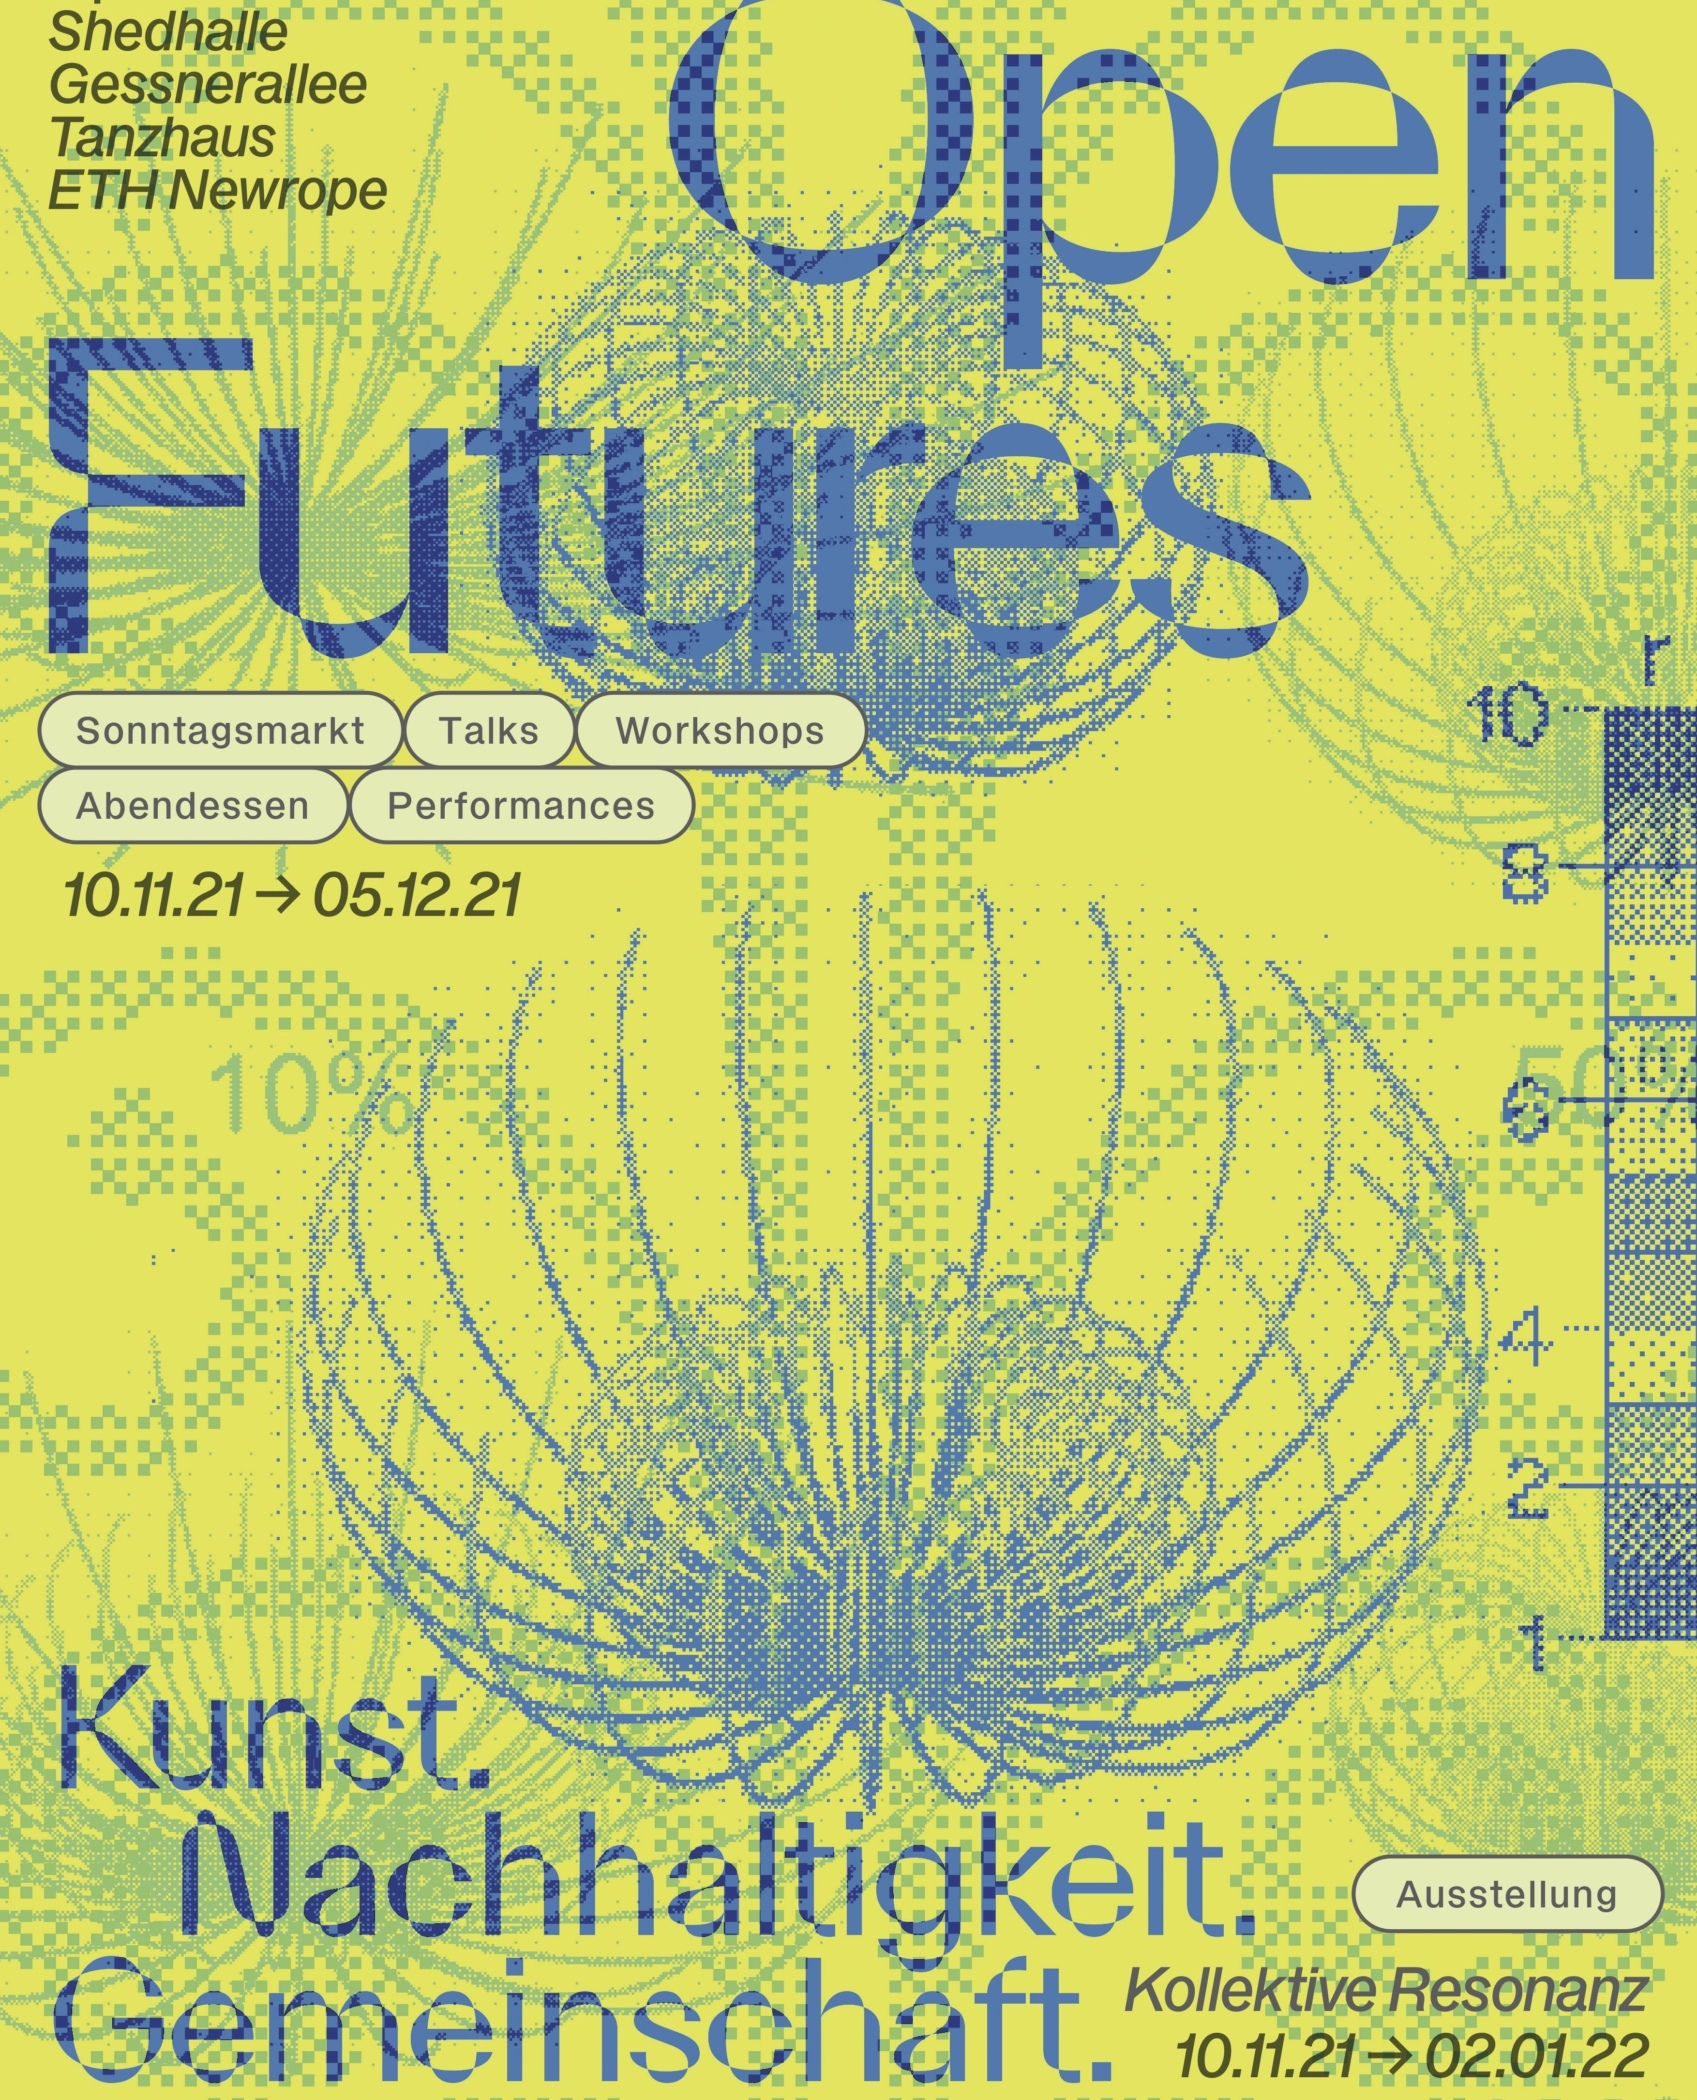 Shedhalle – Open Futures: Protozone5 Kollektive Resonanz